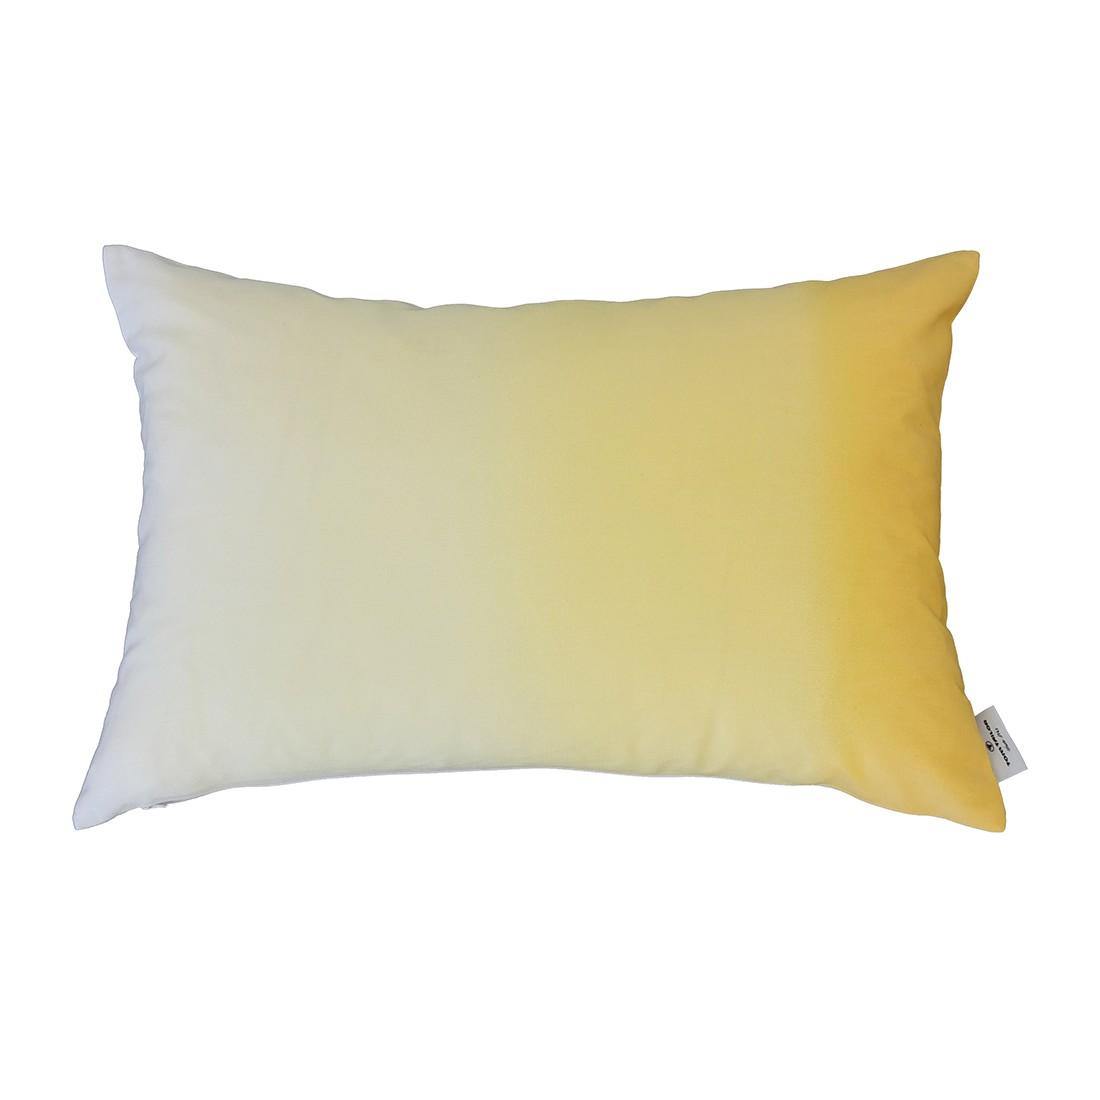 Kissenhülle T-Colour Flow – Gelb – Maße: 35 x 55 cm, Tom Tailor günstig online kaufen